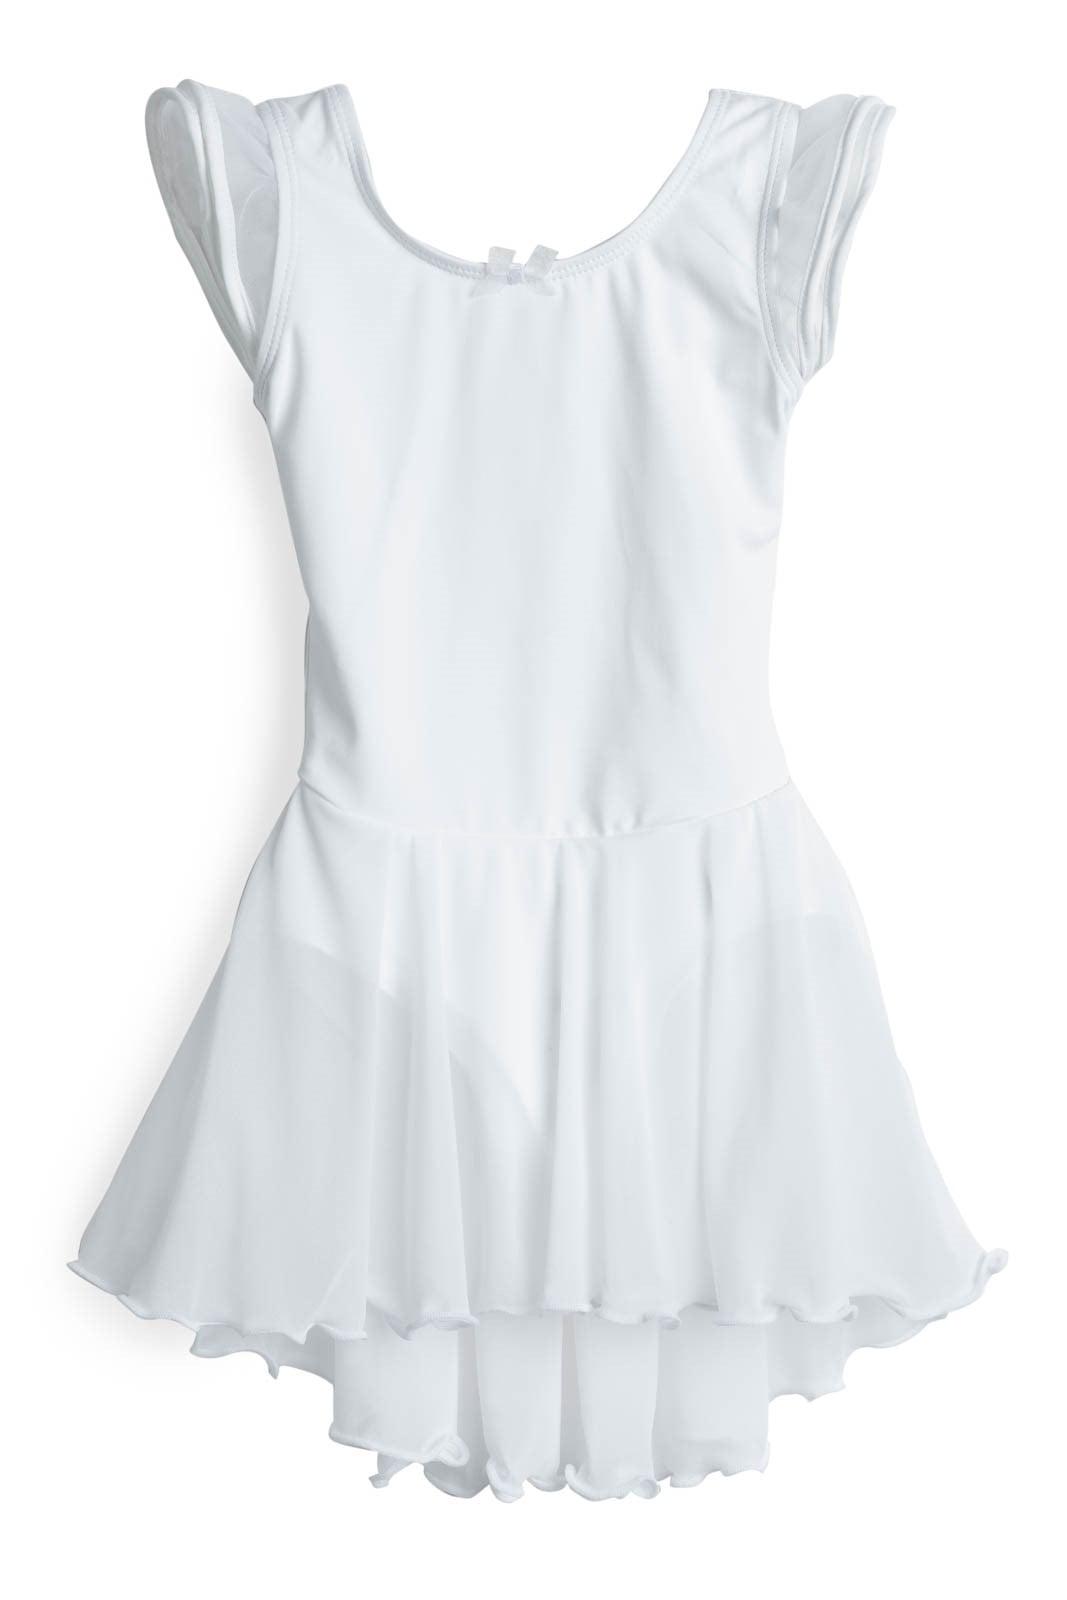 Elowel Kids Girls Basic Short Sleeve Leotard Size 2-14 Years Multiple Colors